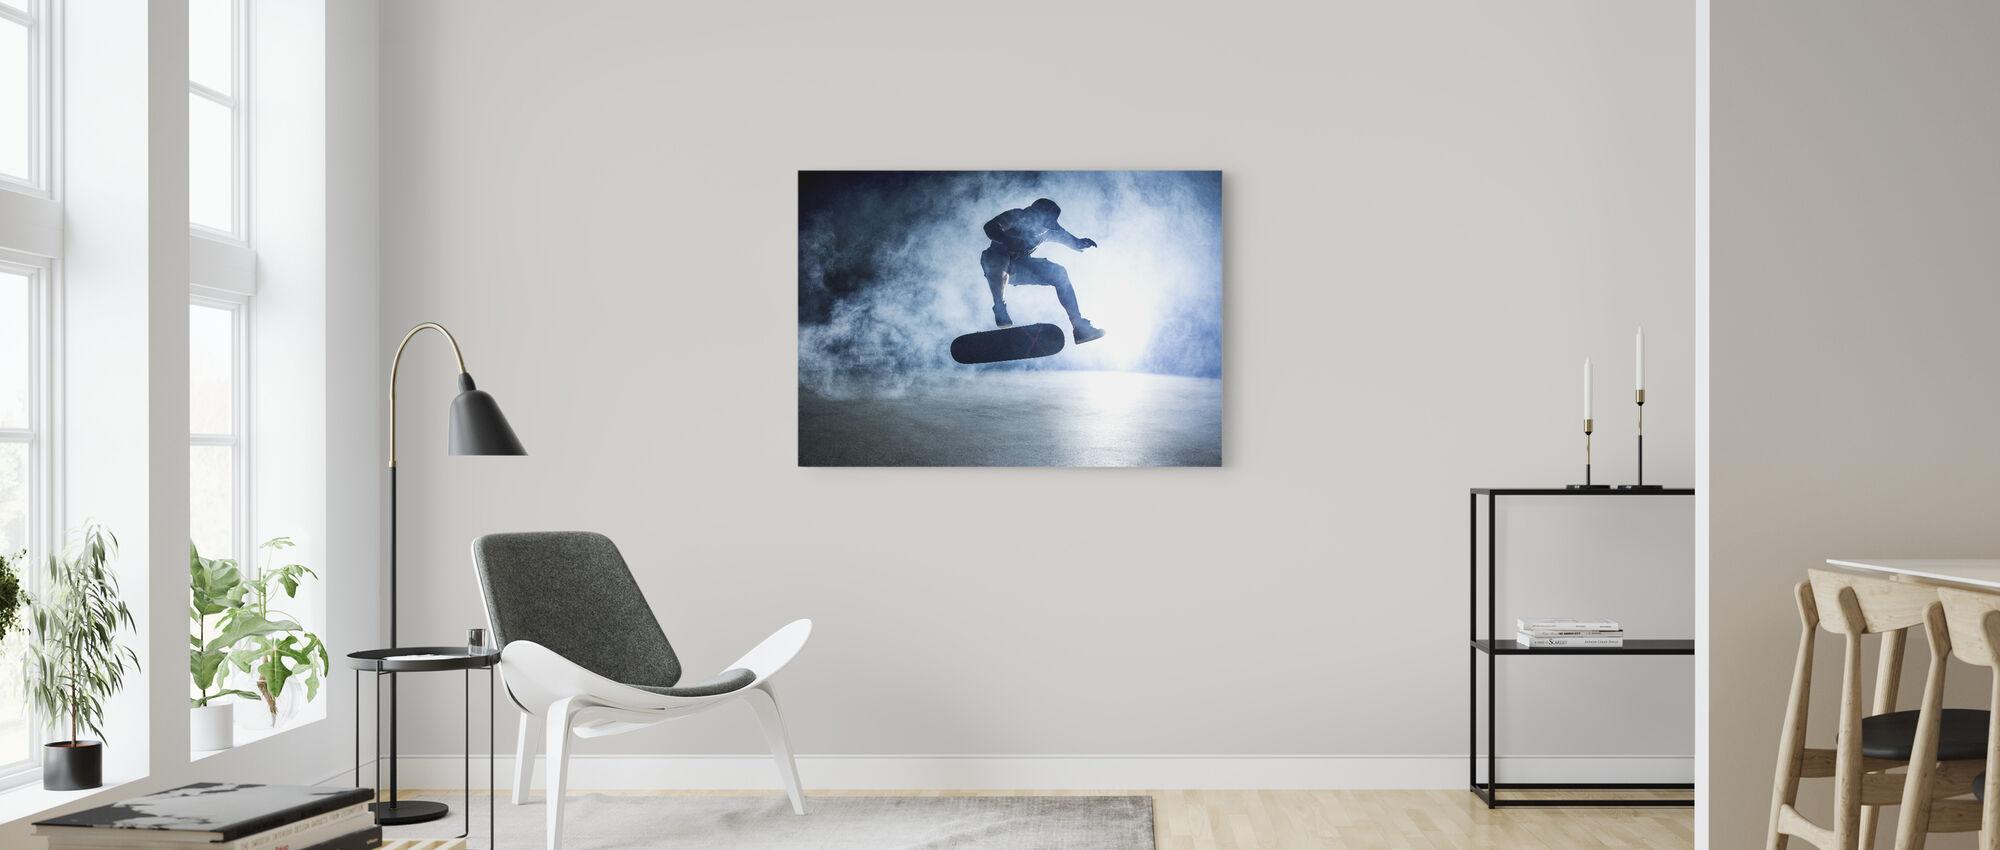 Skateboard Trick - Canvas print - Living Room